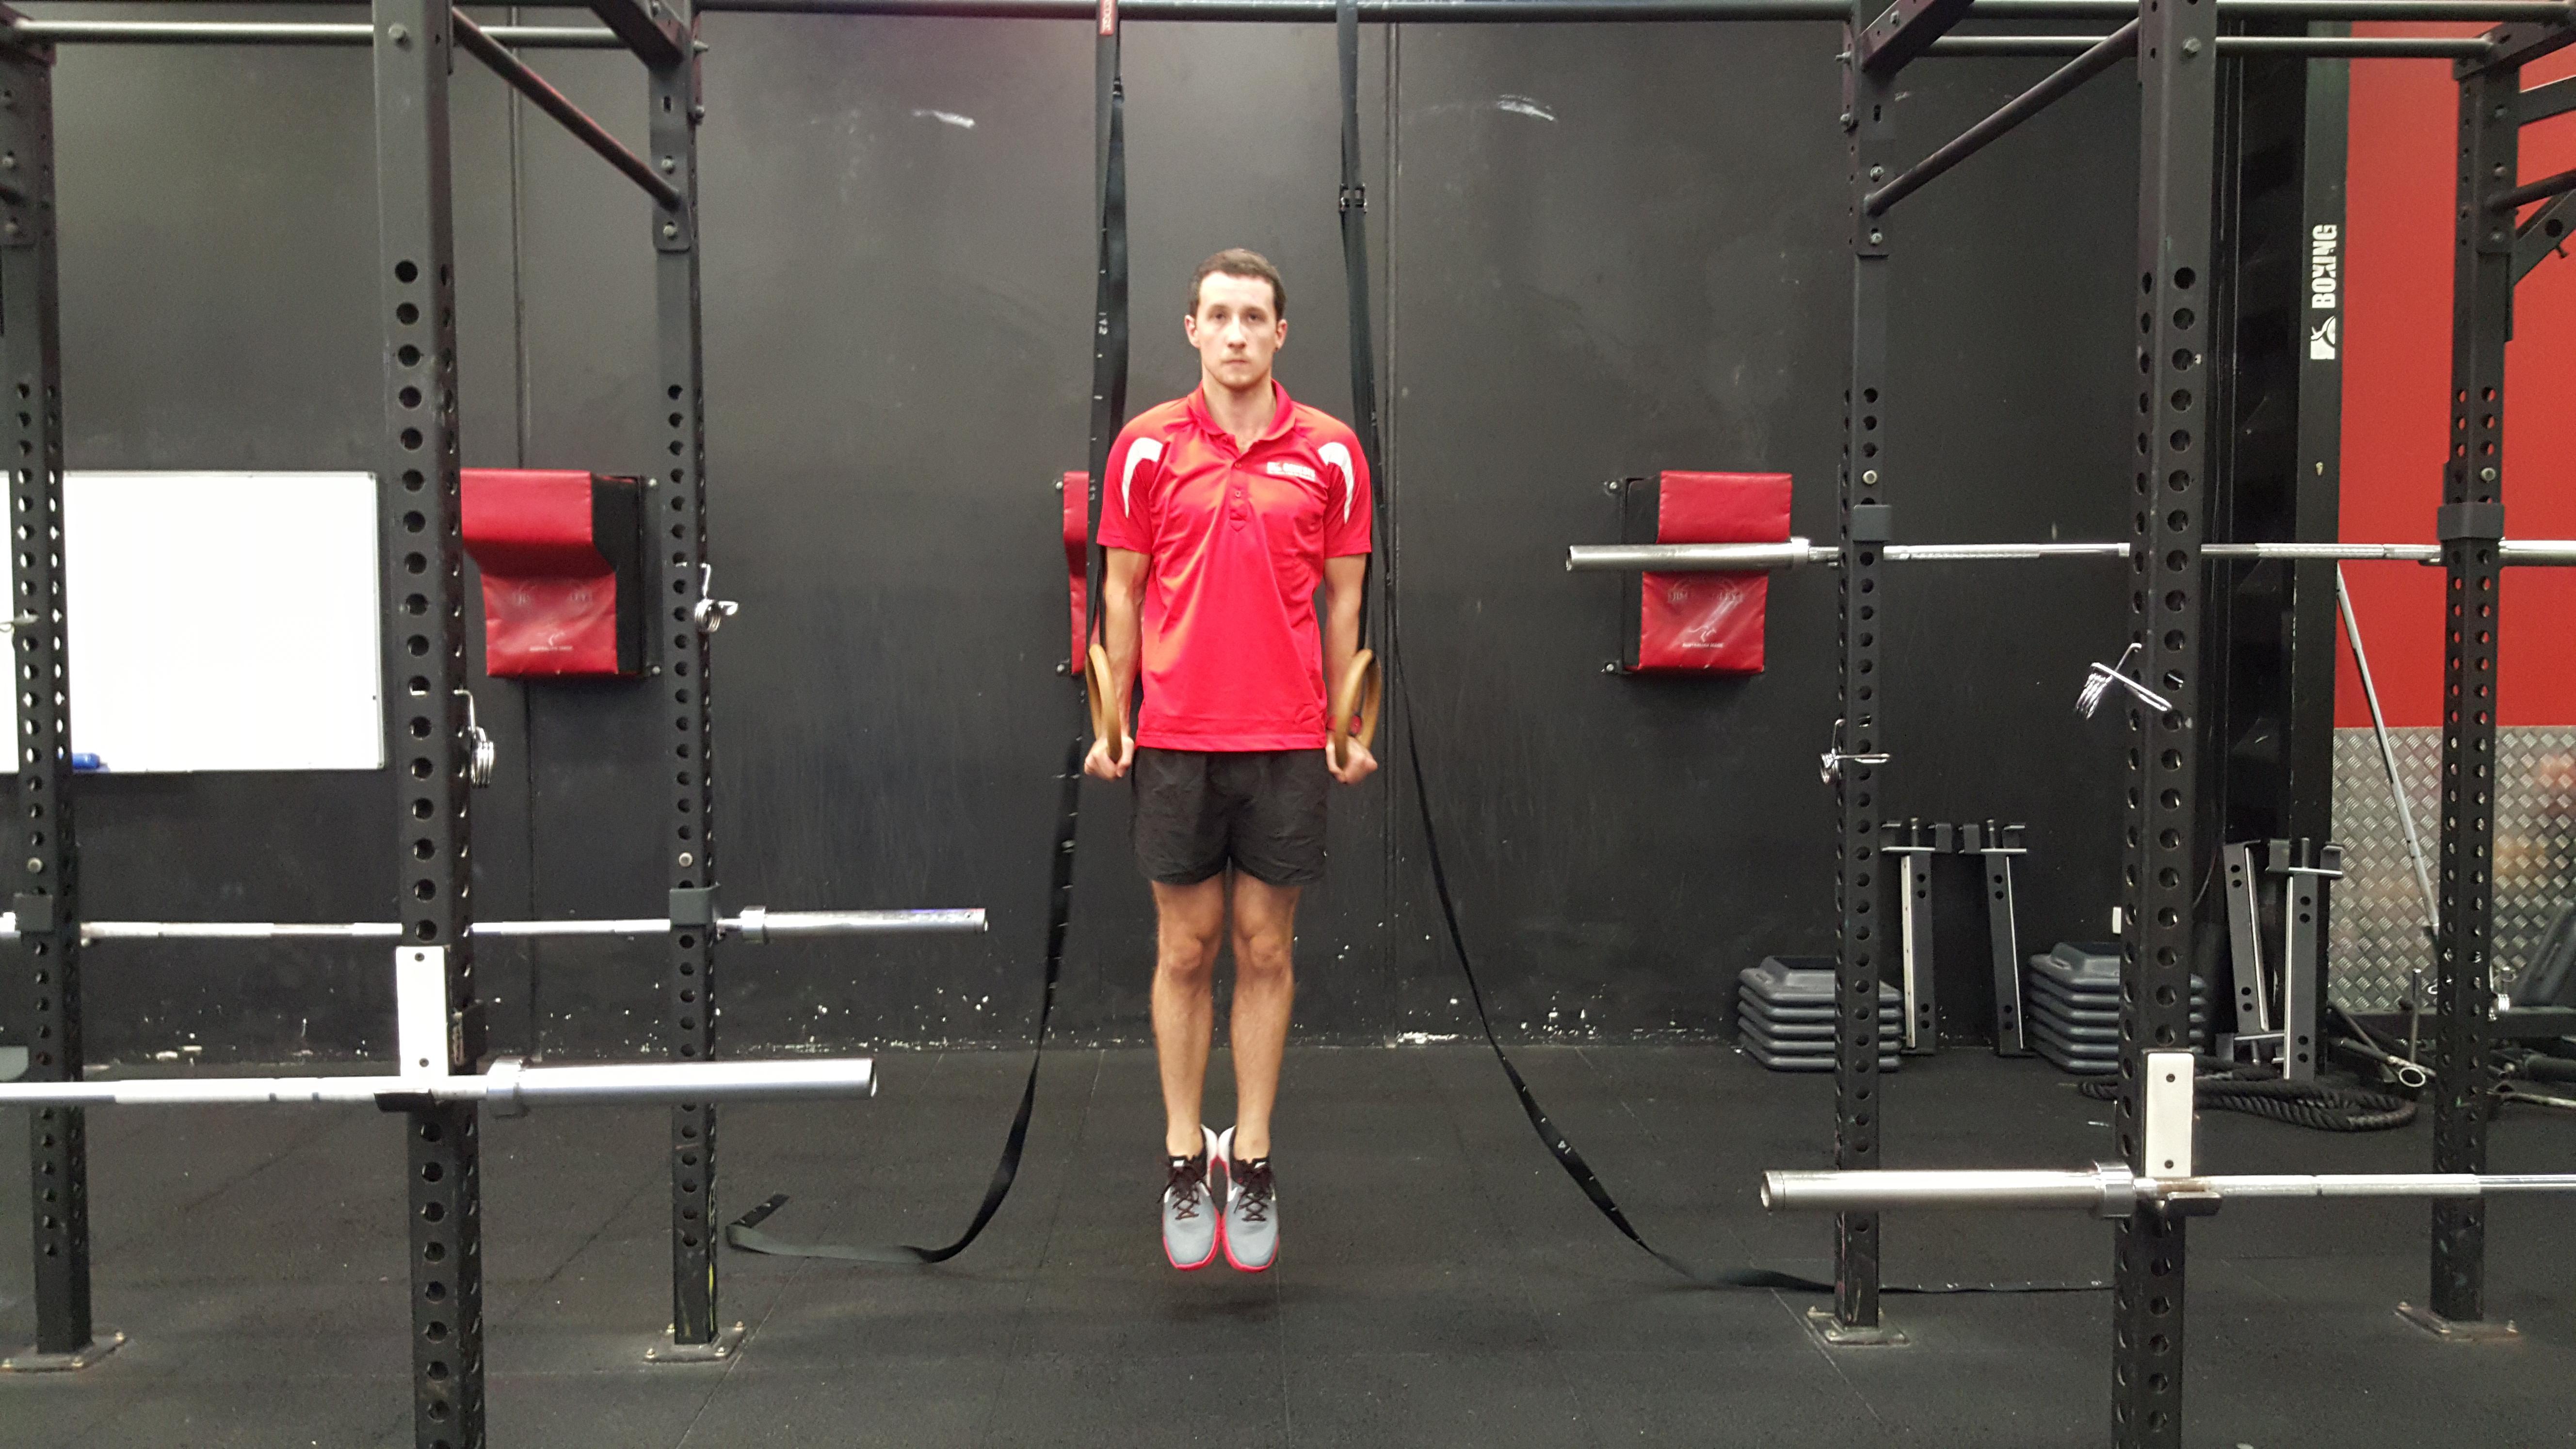 S3 Health And Fitness | U 13 240-260 HILLSBOROUGH Road, Warners Bay, New South Wales 2282 | +61 450 440 752